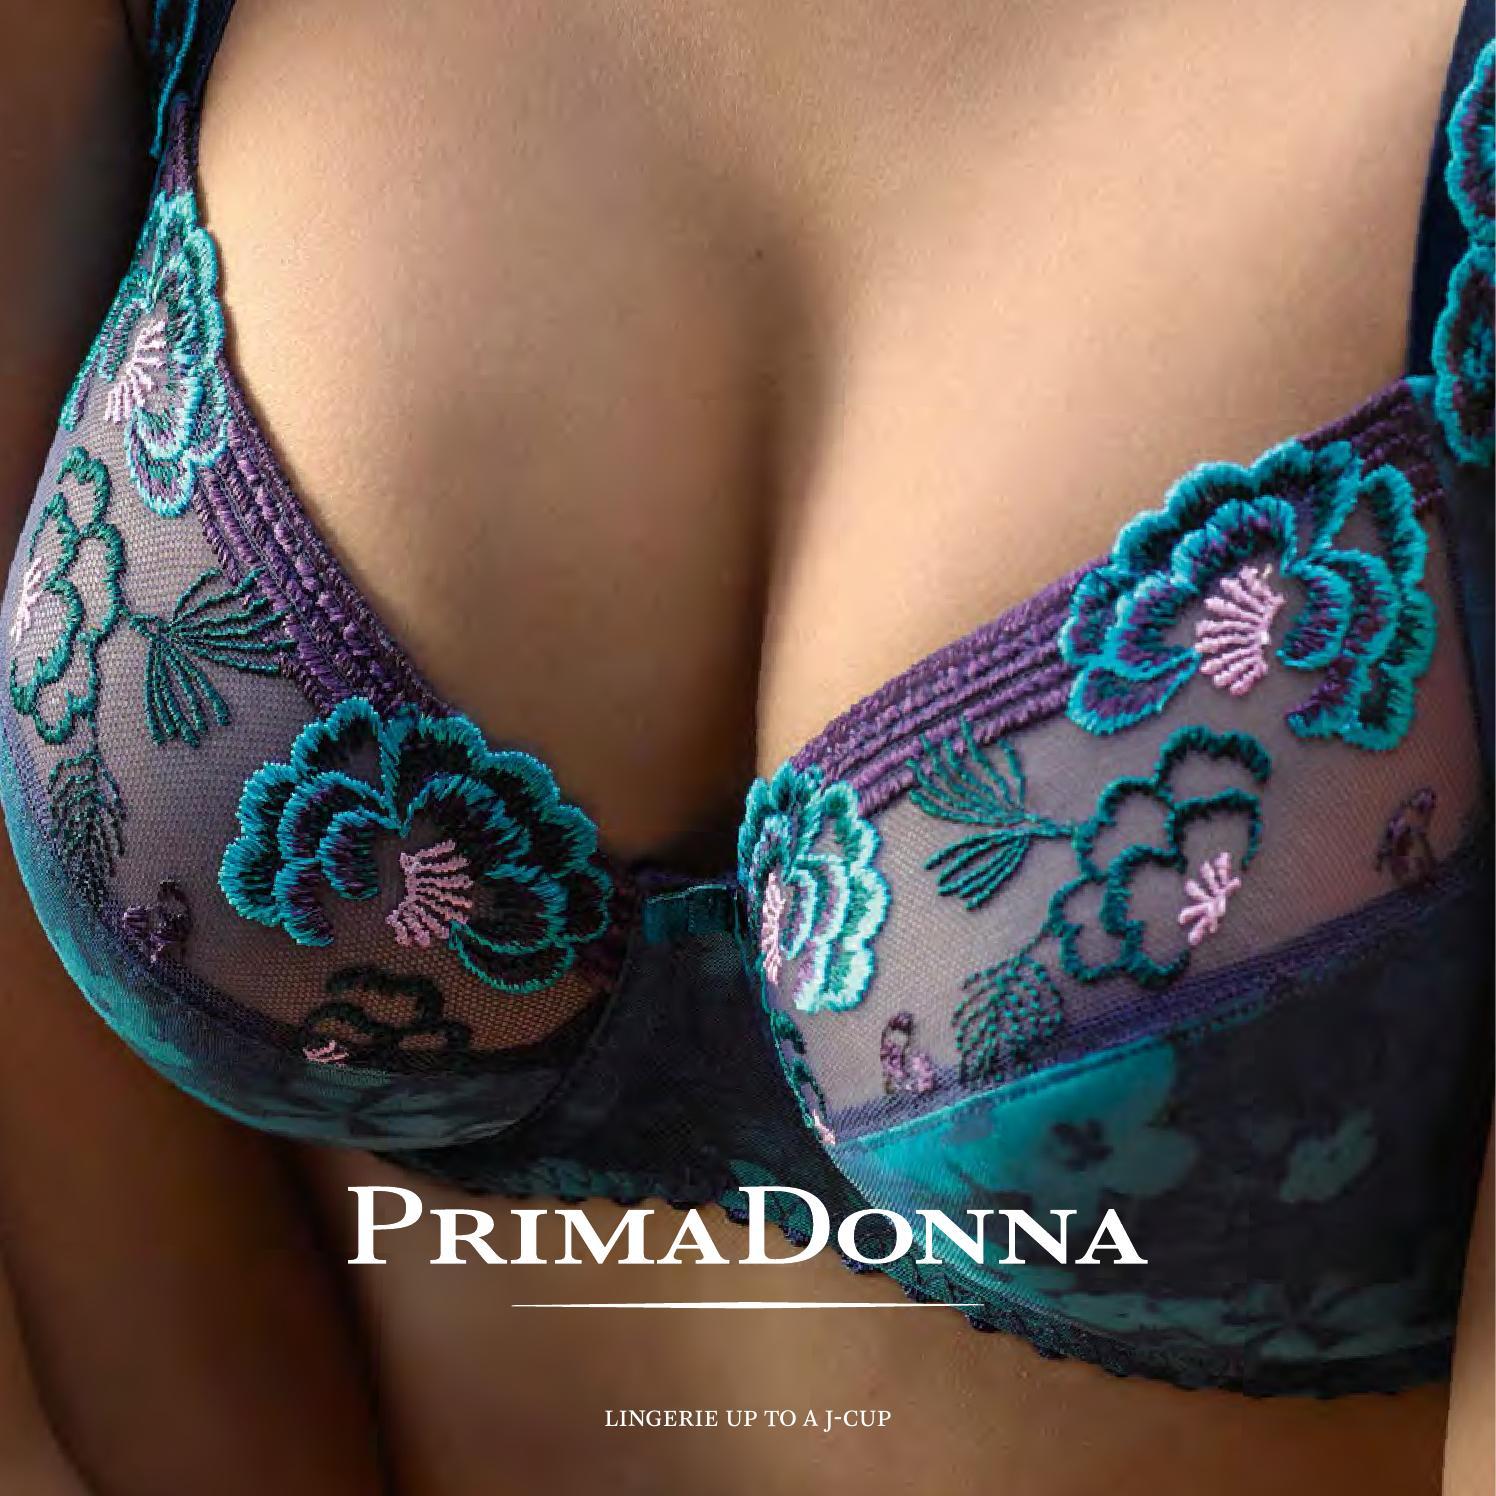 G Prima Donna  Deauville luxuriöse Short-Hotpants 0561813  Shorty Ruby Gold